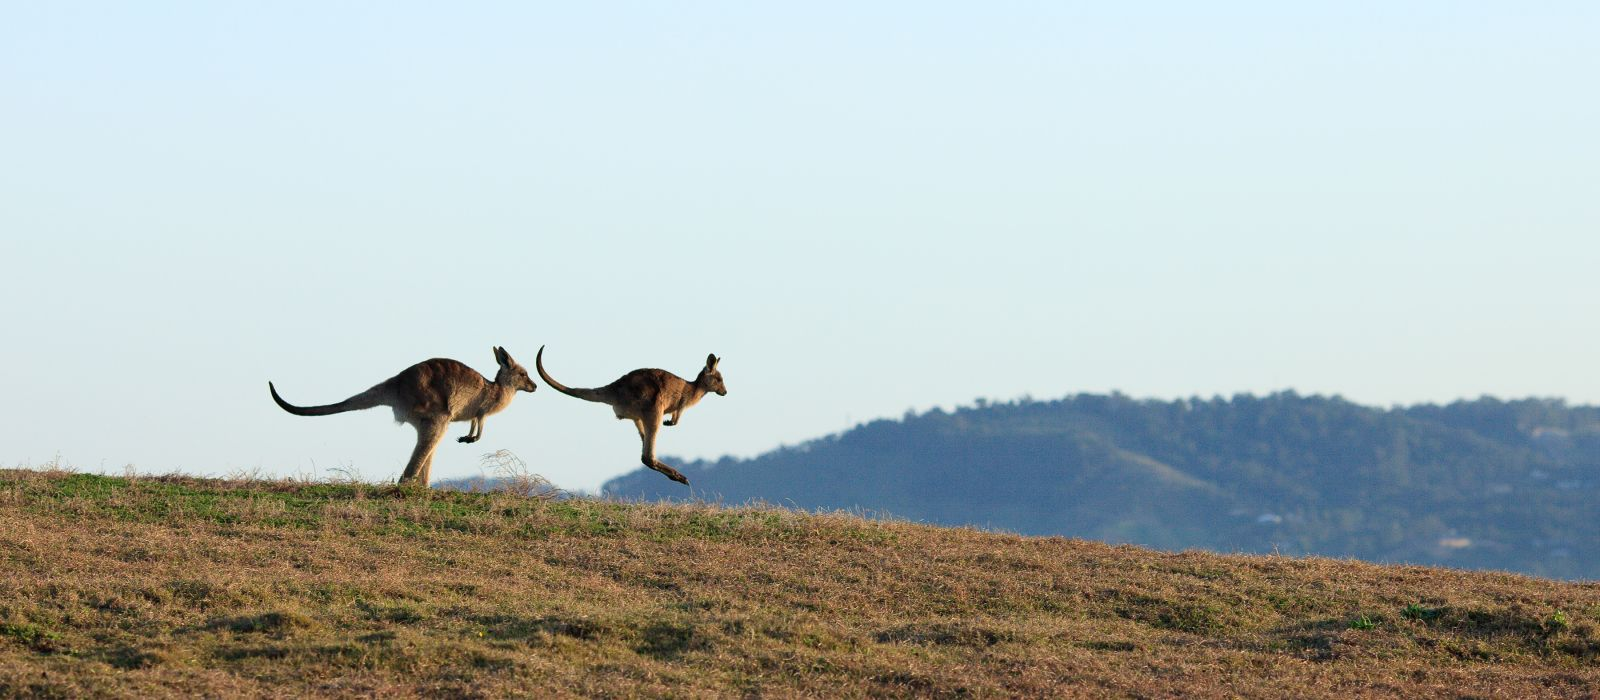 Kangaroos on the horizon, Emerald Beach, Australia